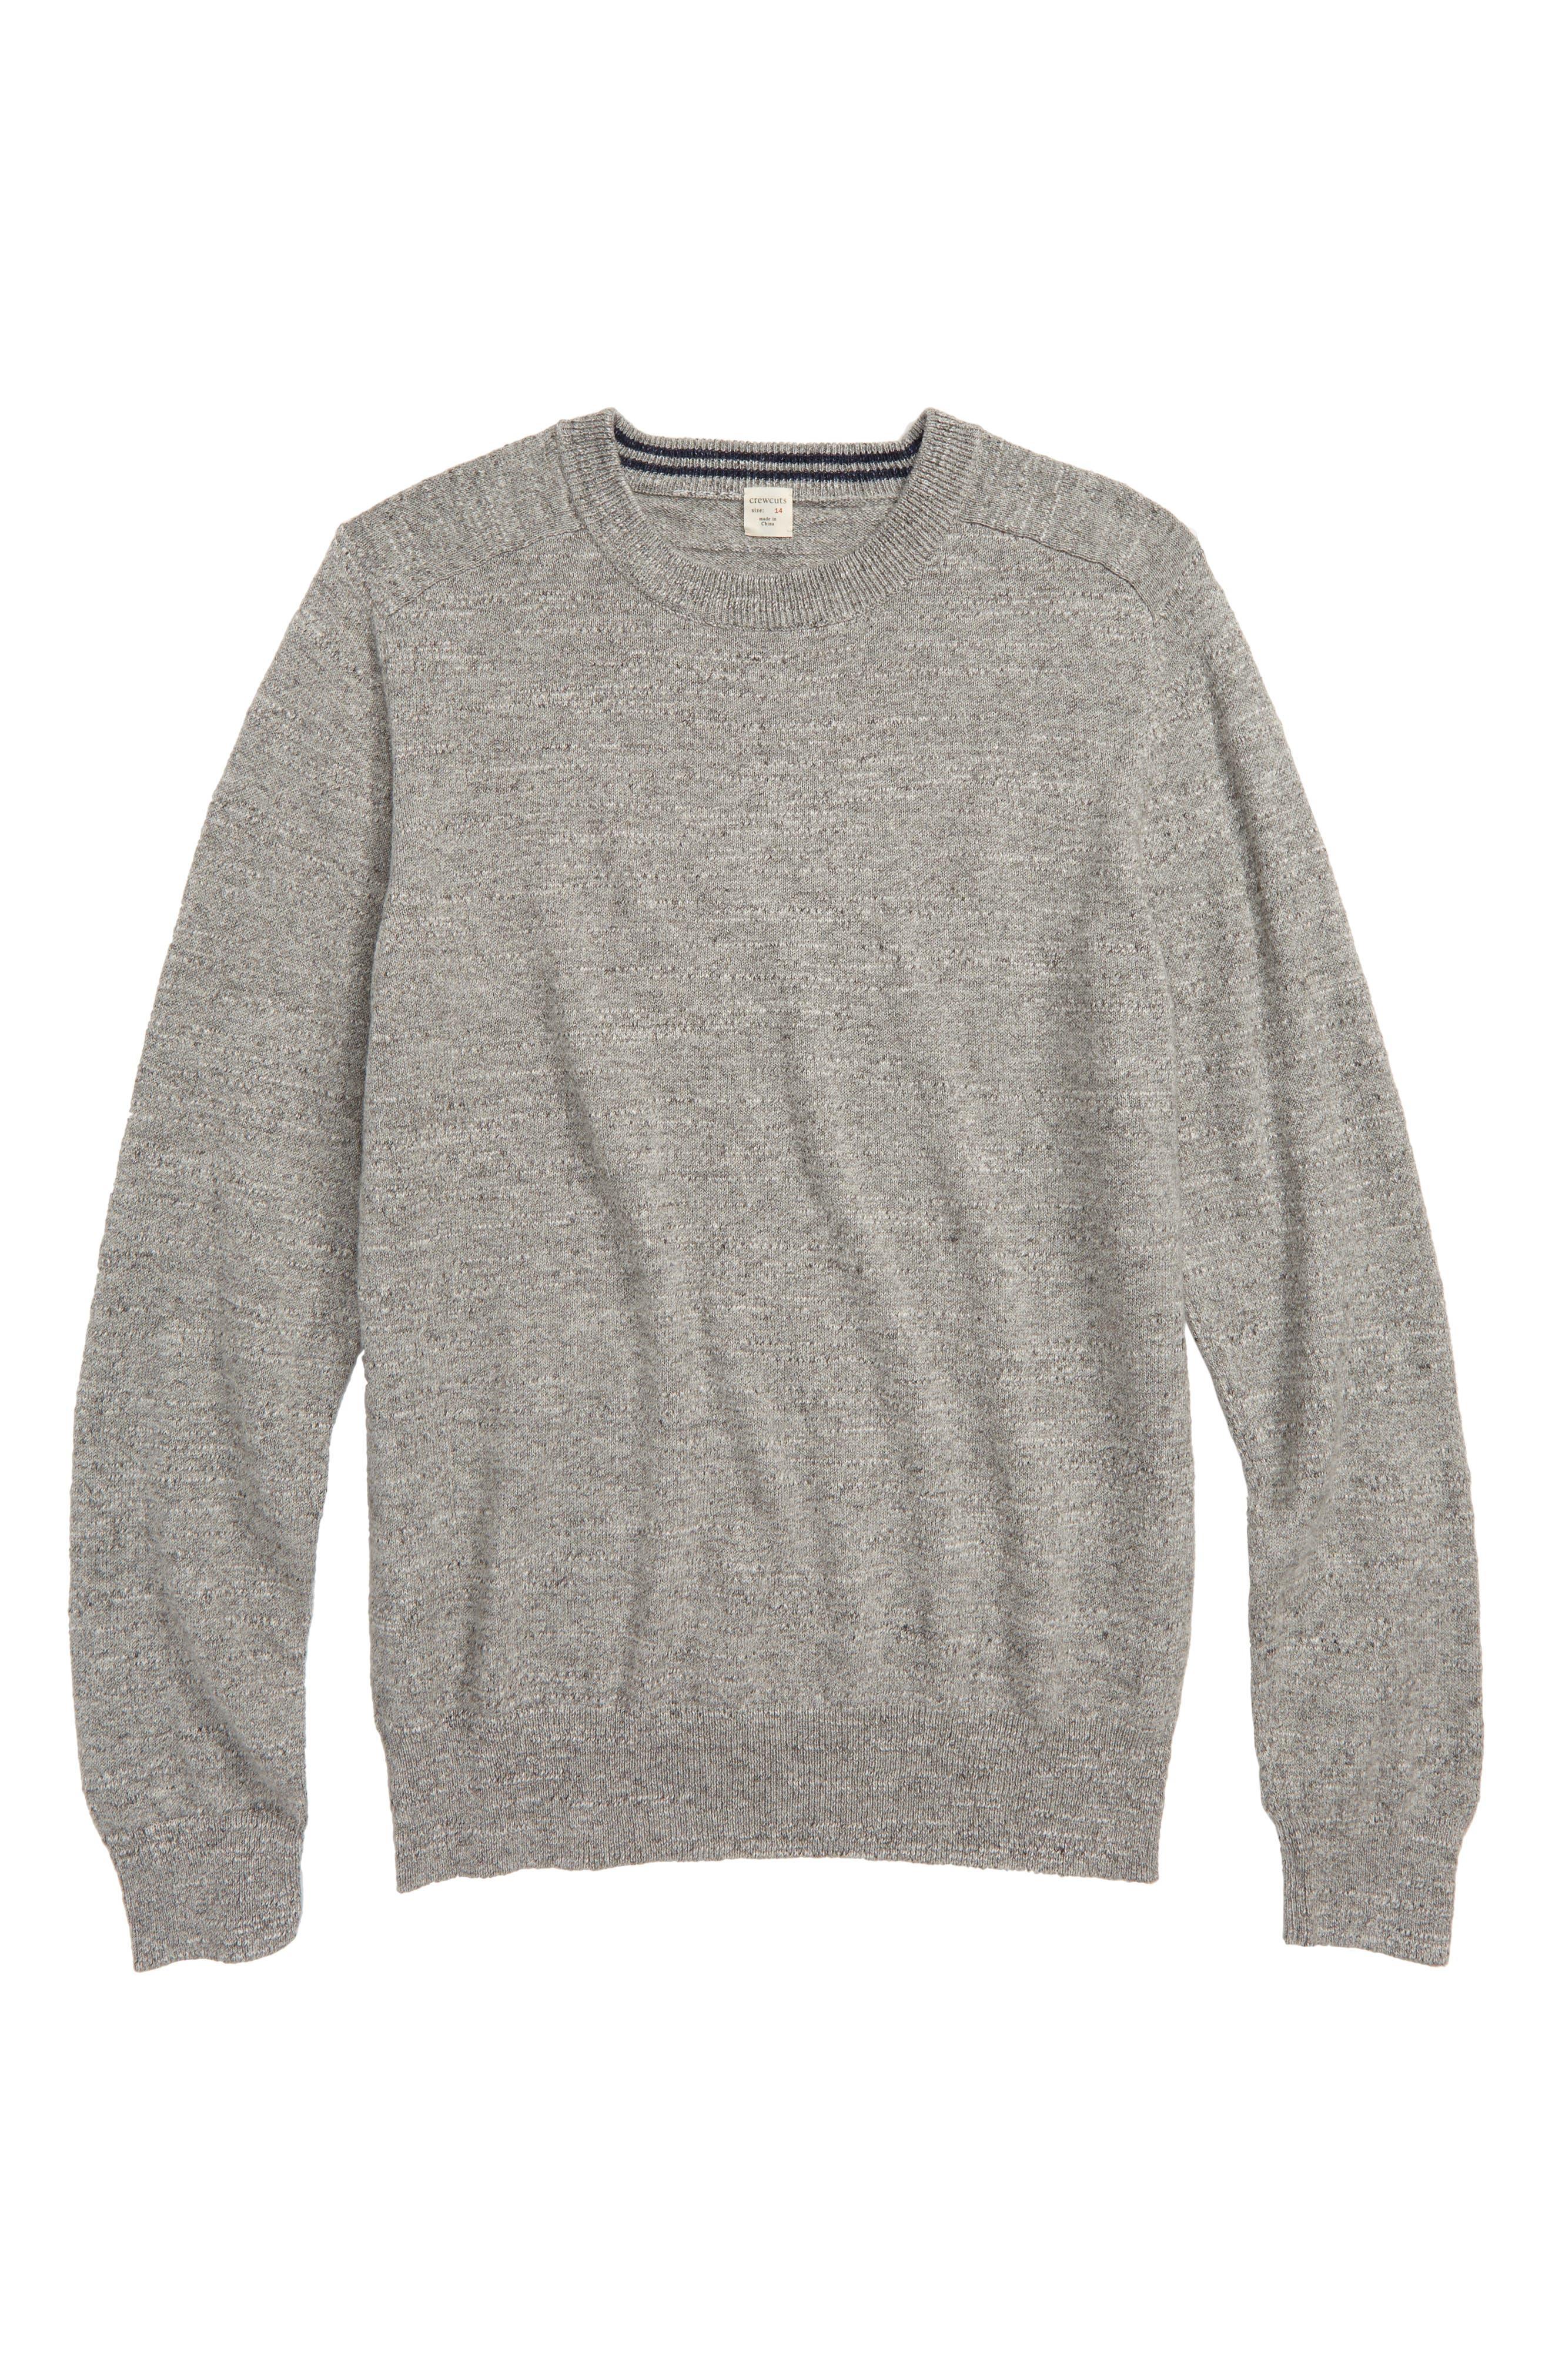 Cotton Crewneck Sweater,                         Main,                         color, HEATHER GREY INDIGO